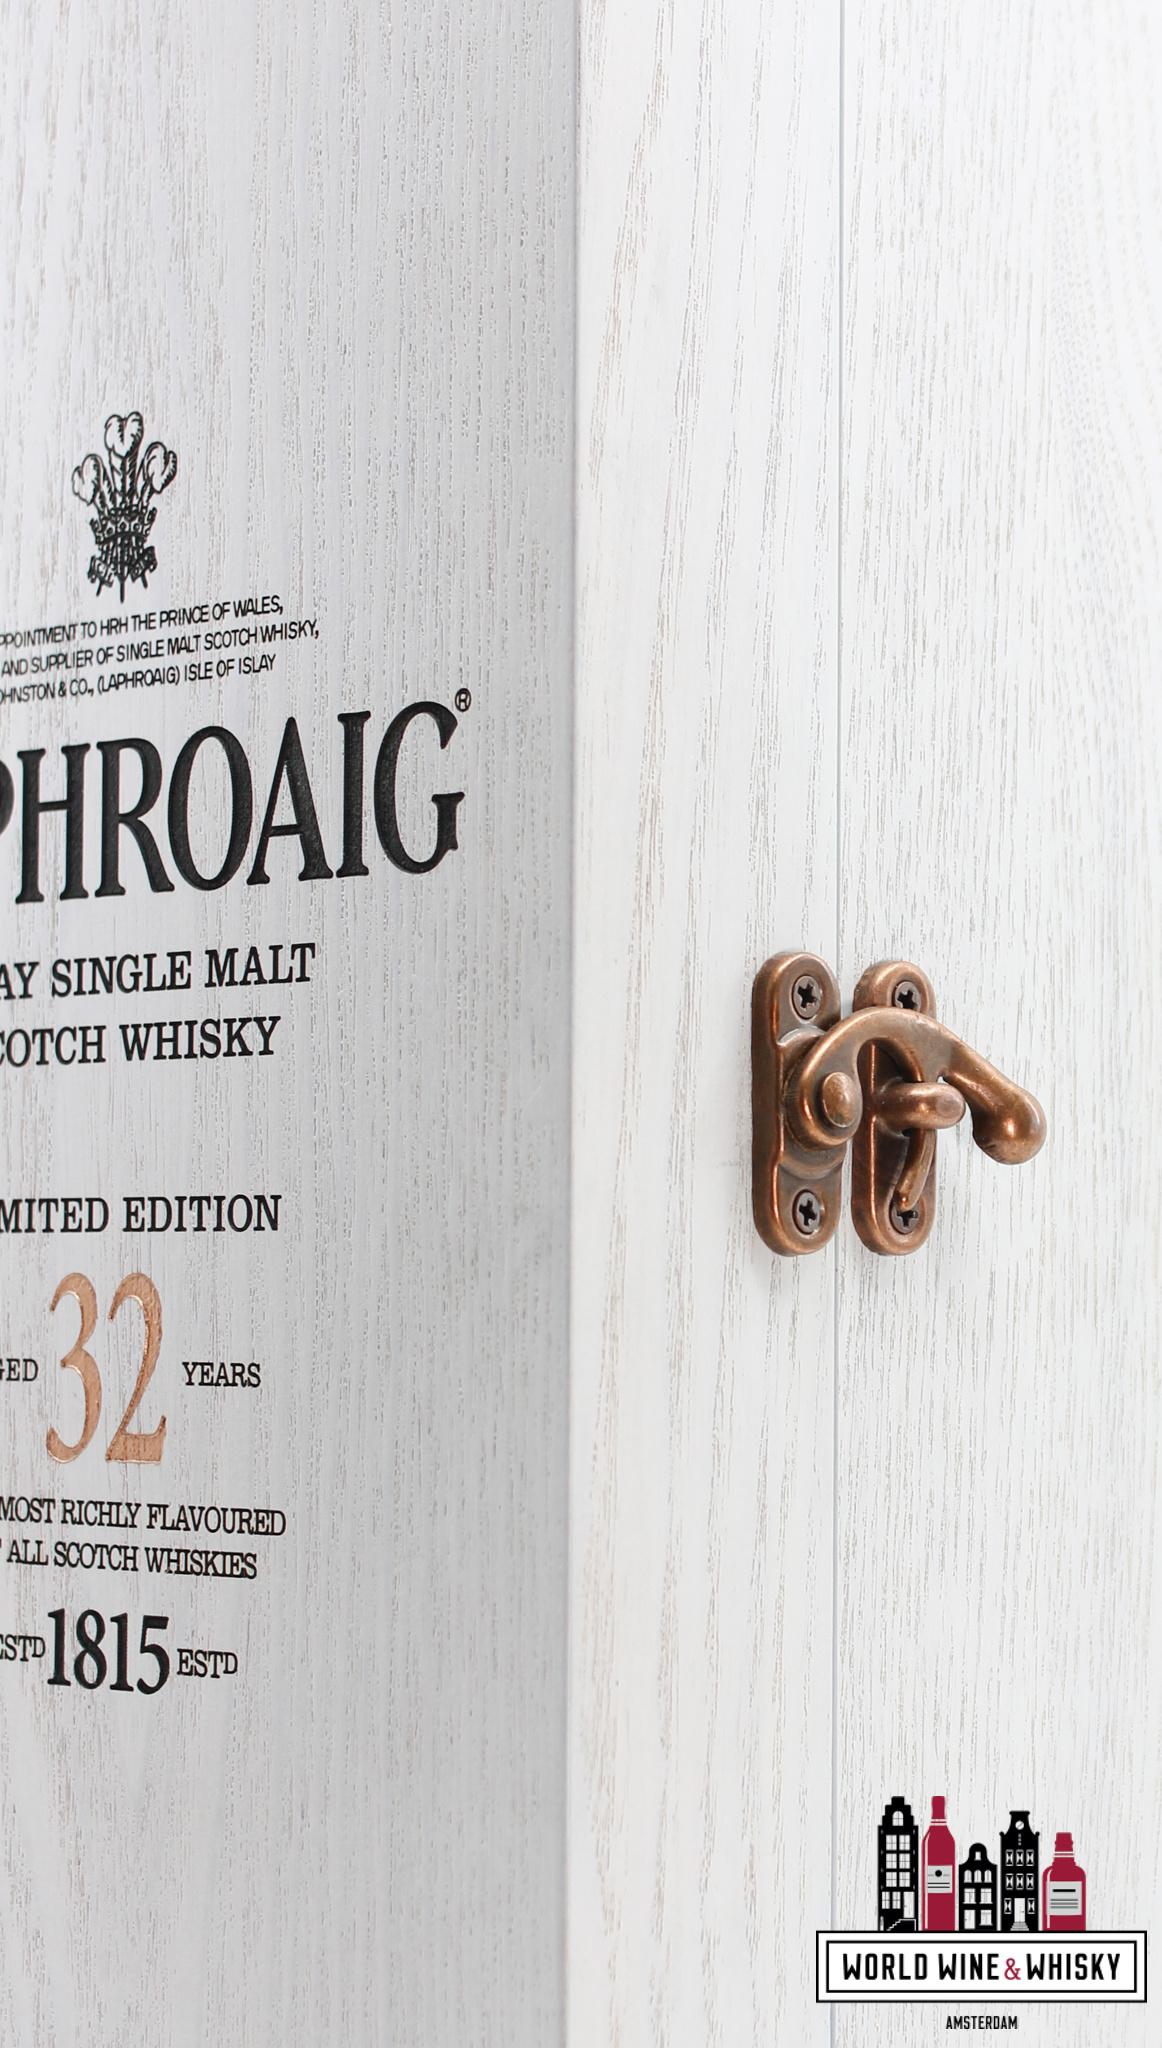 Laphroaig Laphroaig 32 Years Old 2015 - Limited Edition 46.6% (1 of 5880)